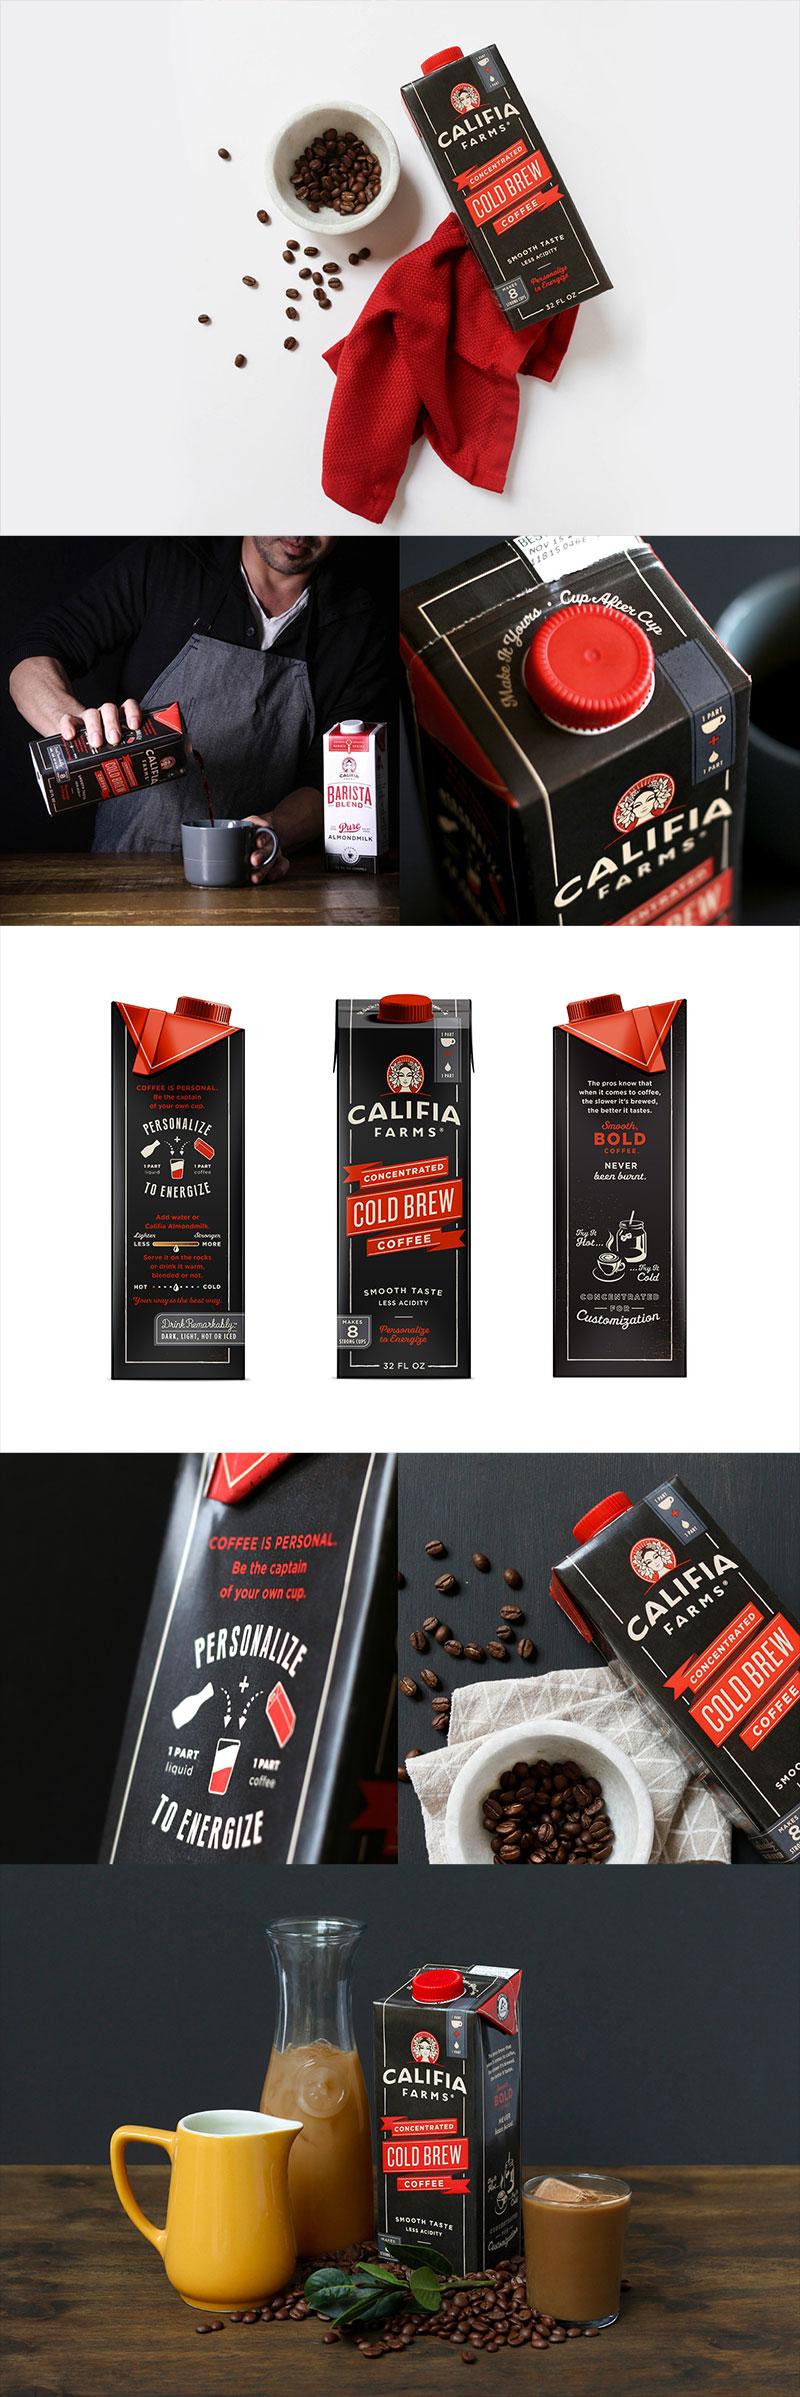 Califia Farms - Concentrated Cold Brew Coffee by Farm Design